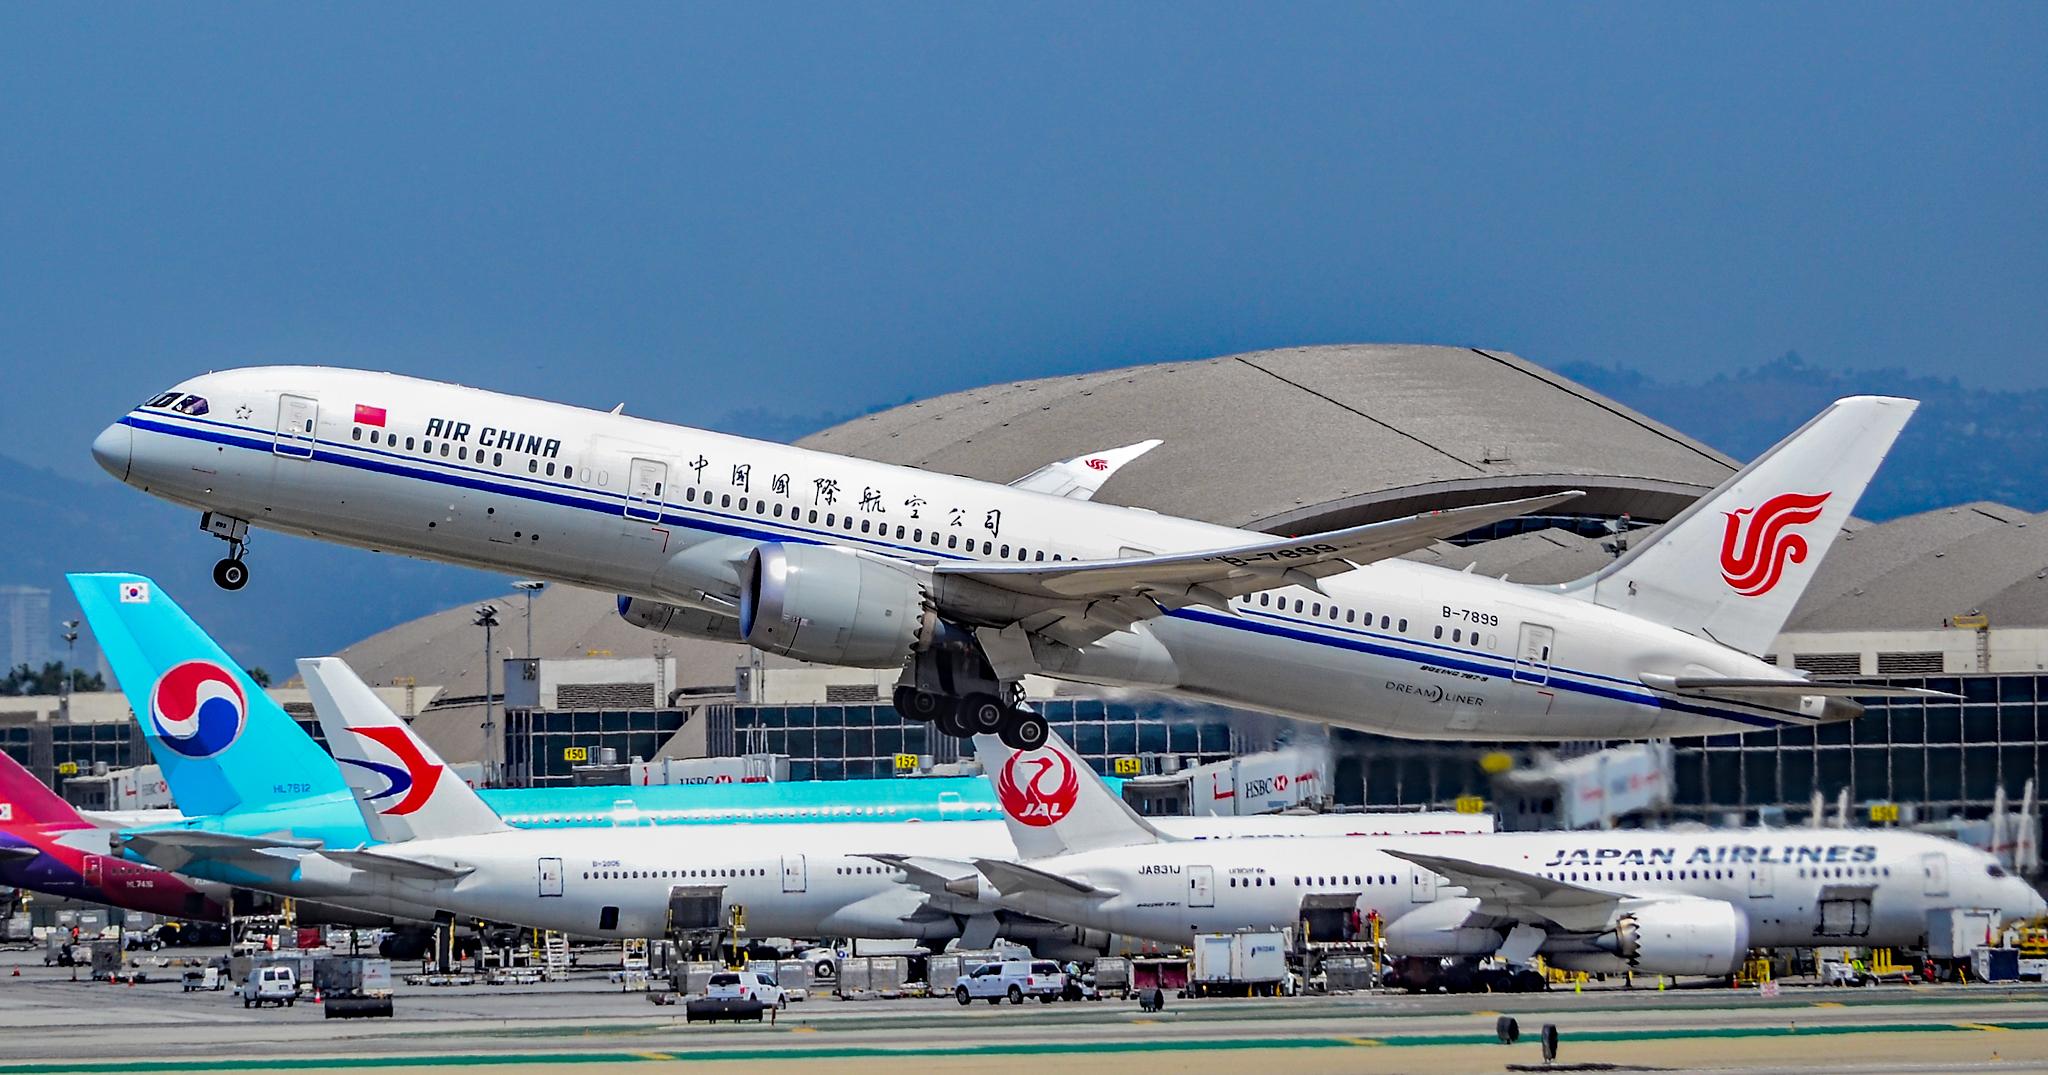 File:B-7899 Air China Boeing 787-9 Dreamliner s-n 34311 (37846634196